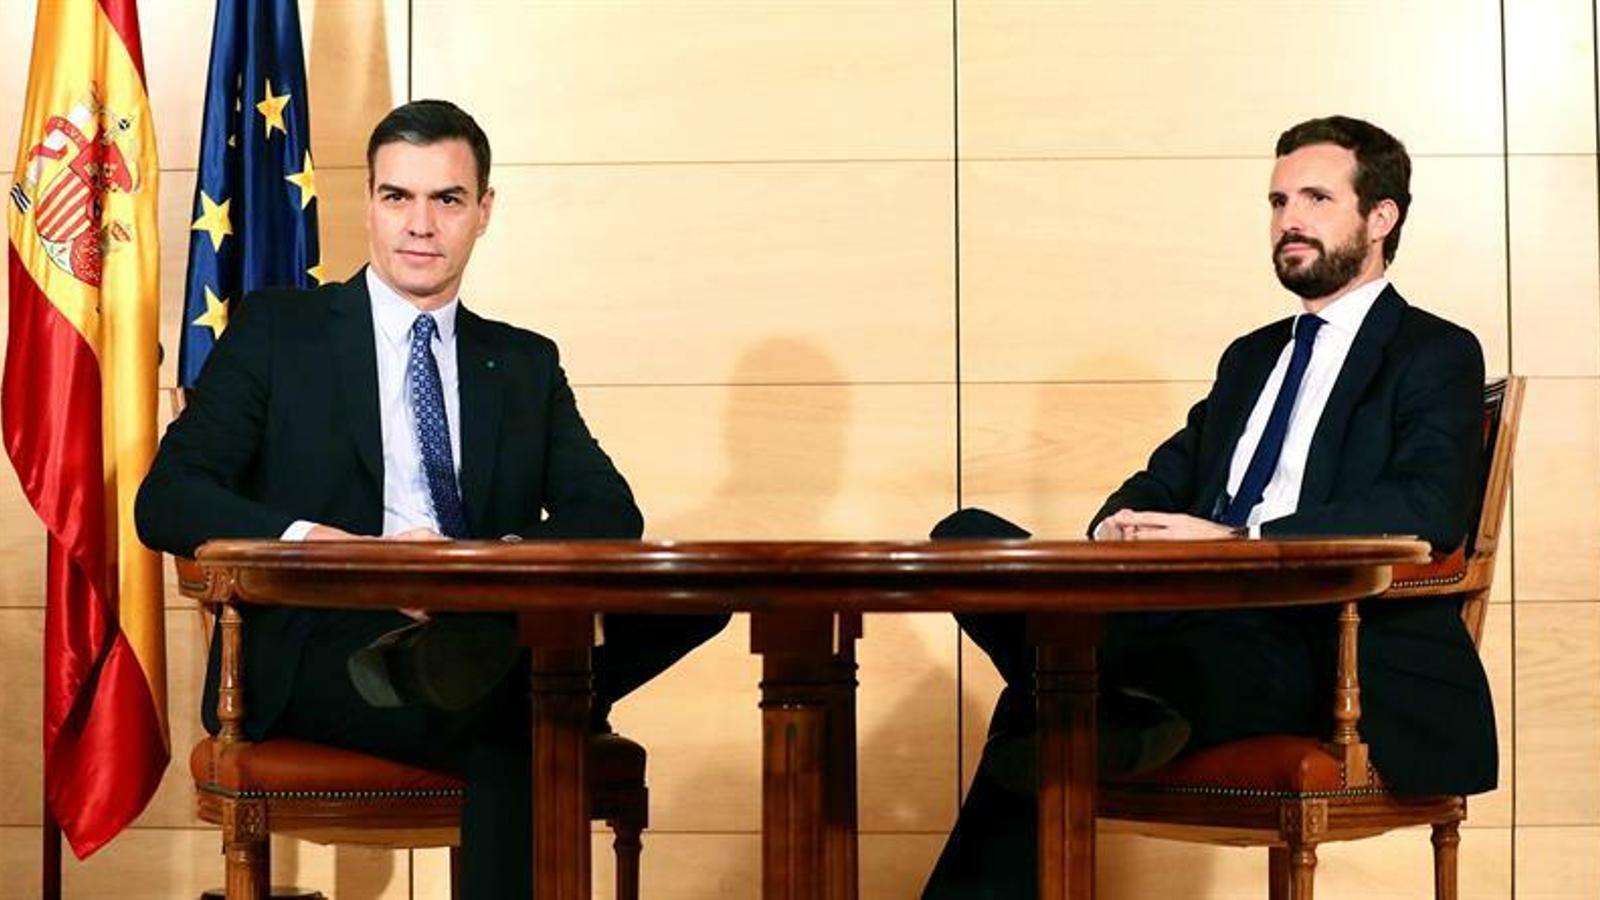 El candidat a la investidura, Pedro Sánchez, amb el líder del PP, Pablo Casado, en una reunió al Congrés.